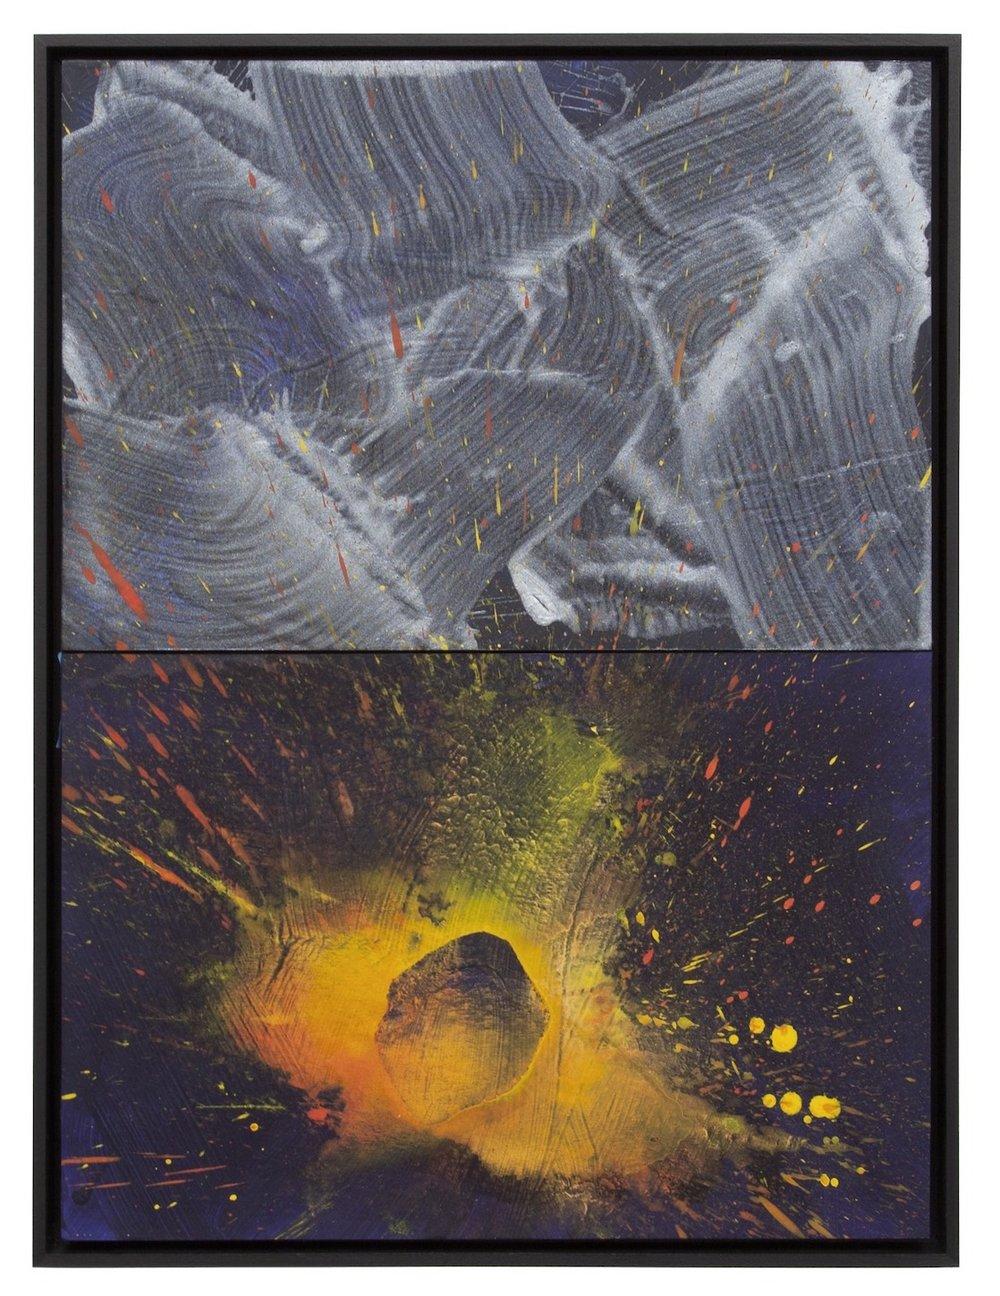 "Forbidden Fruit  Acrylic on Archival Foam Board 24.25 x 18"" 2016  INQUIRE"